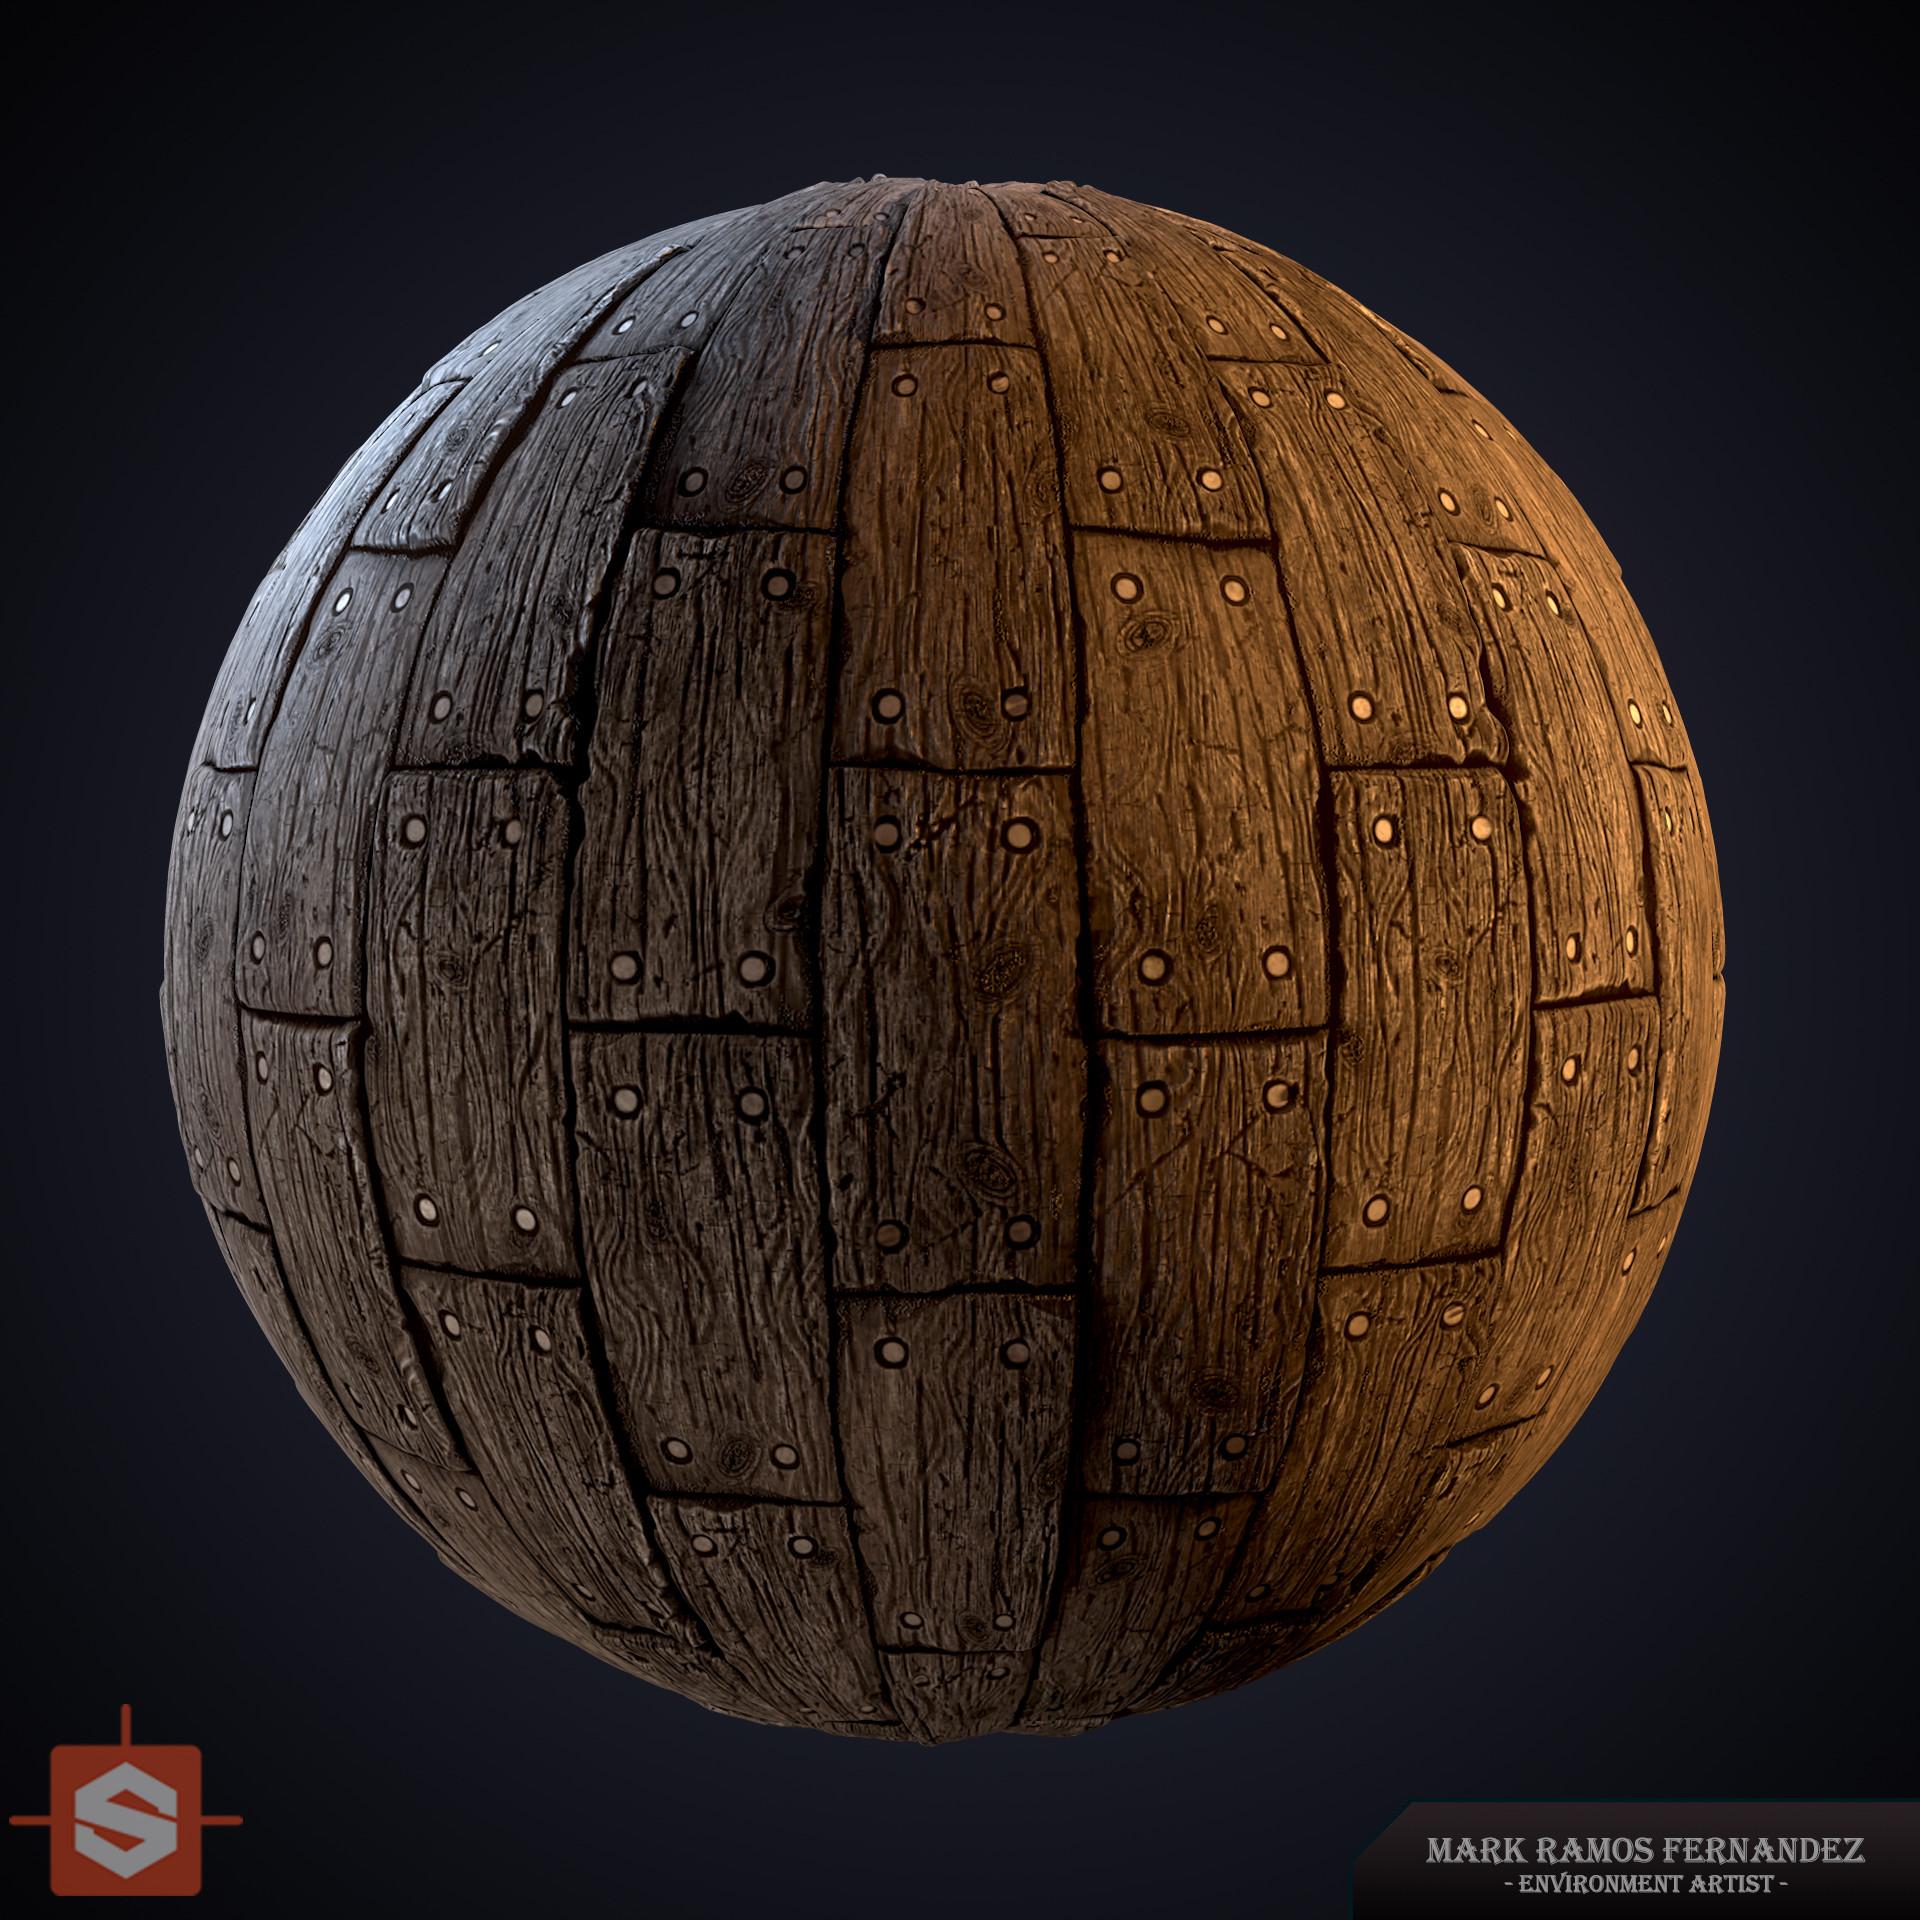 ArtStation - Substance Designer - Wooden Planks Aged, Mark Ramos